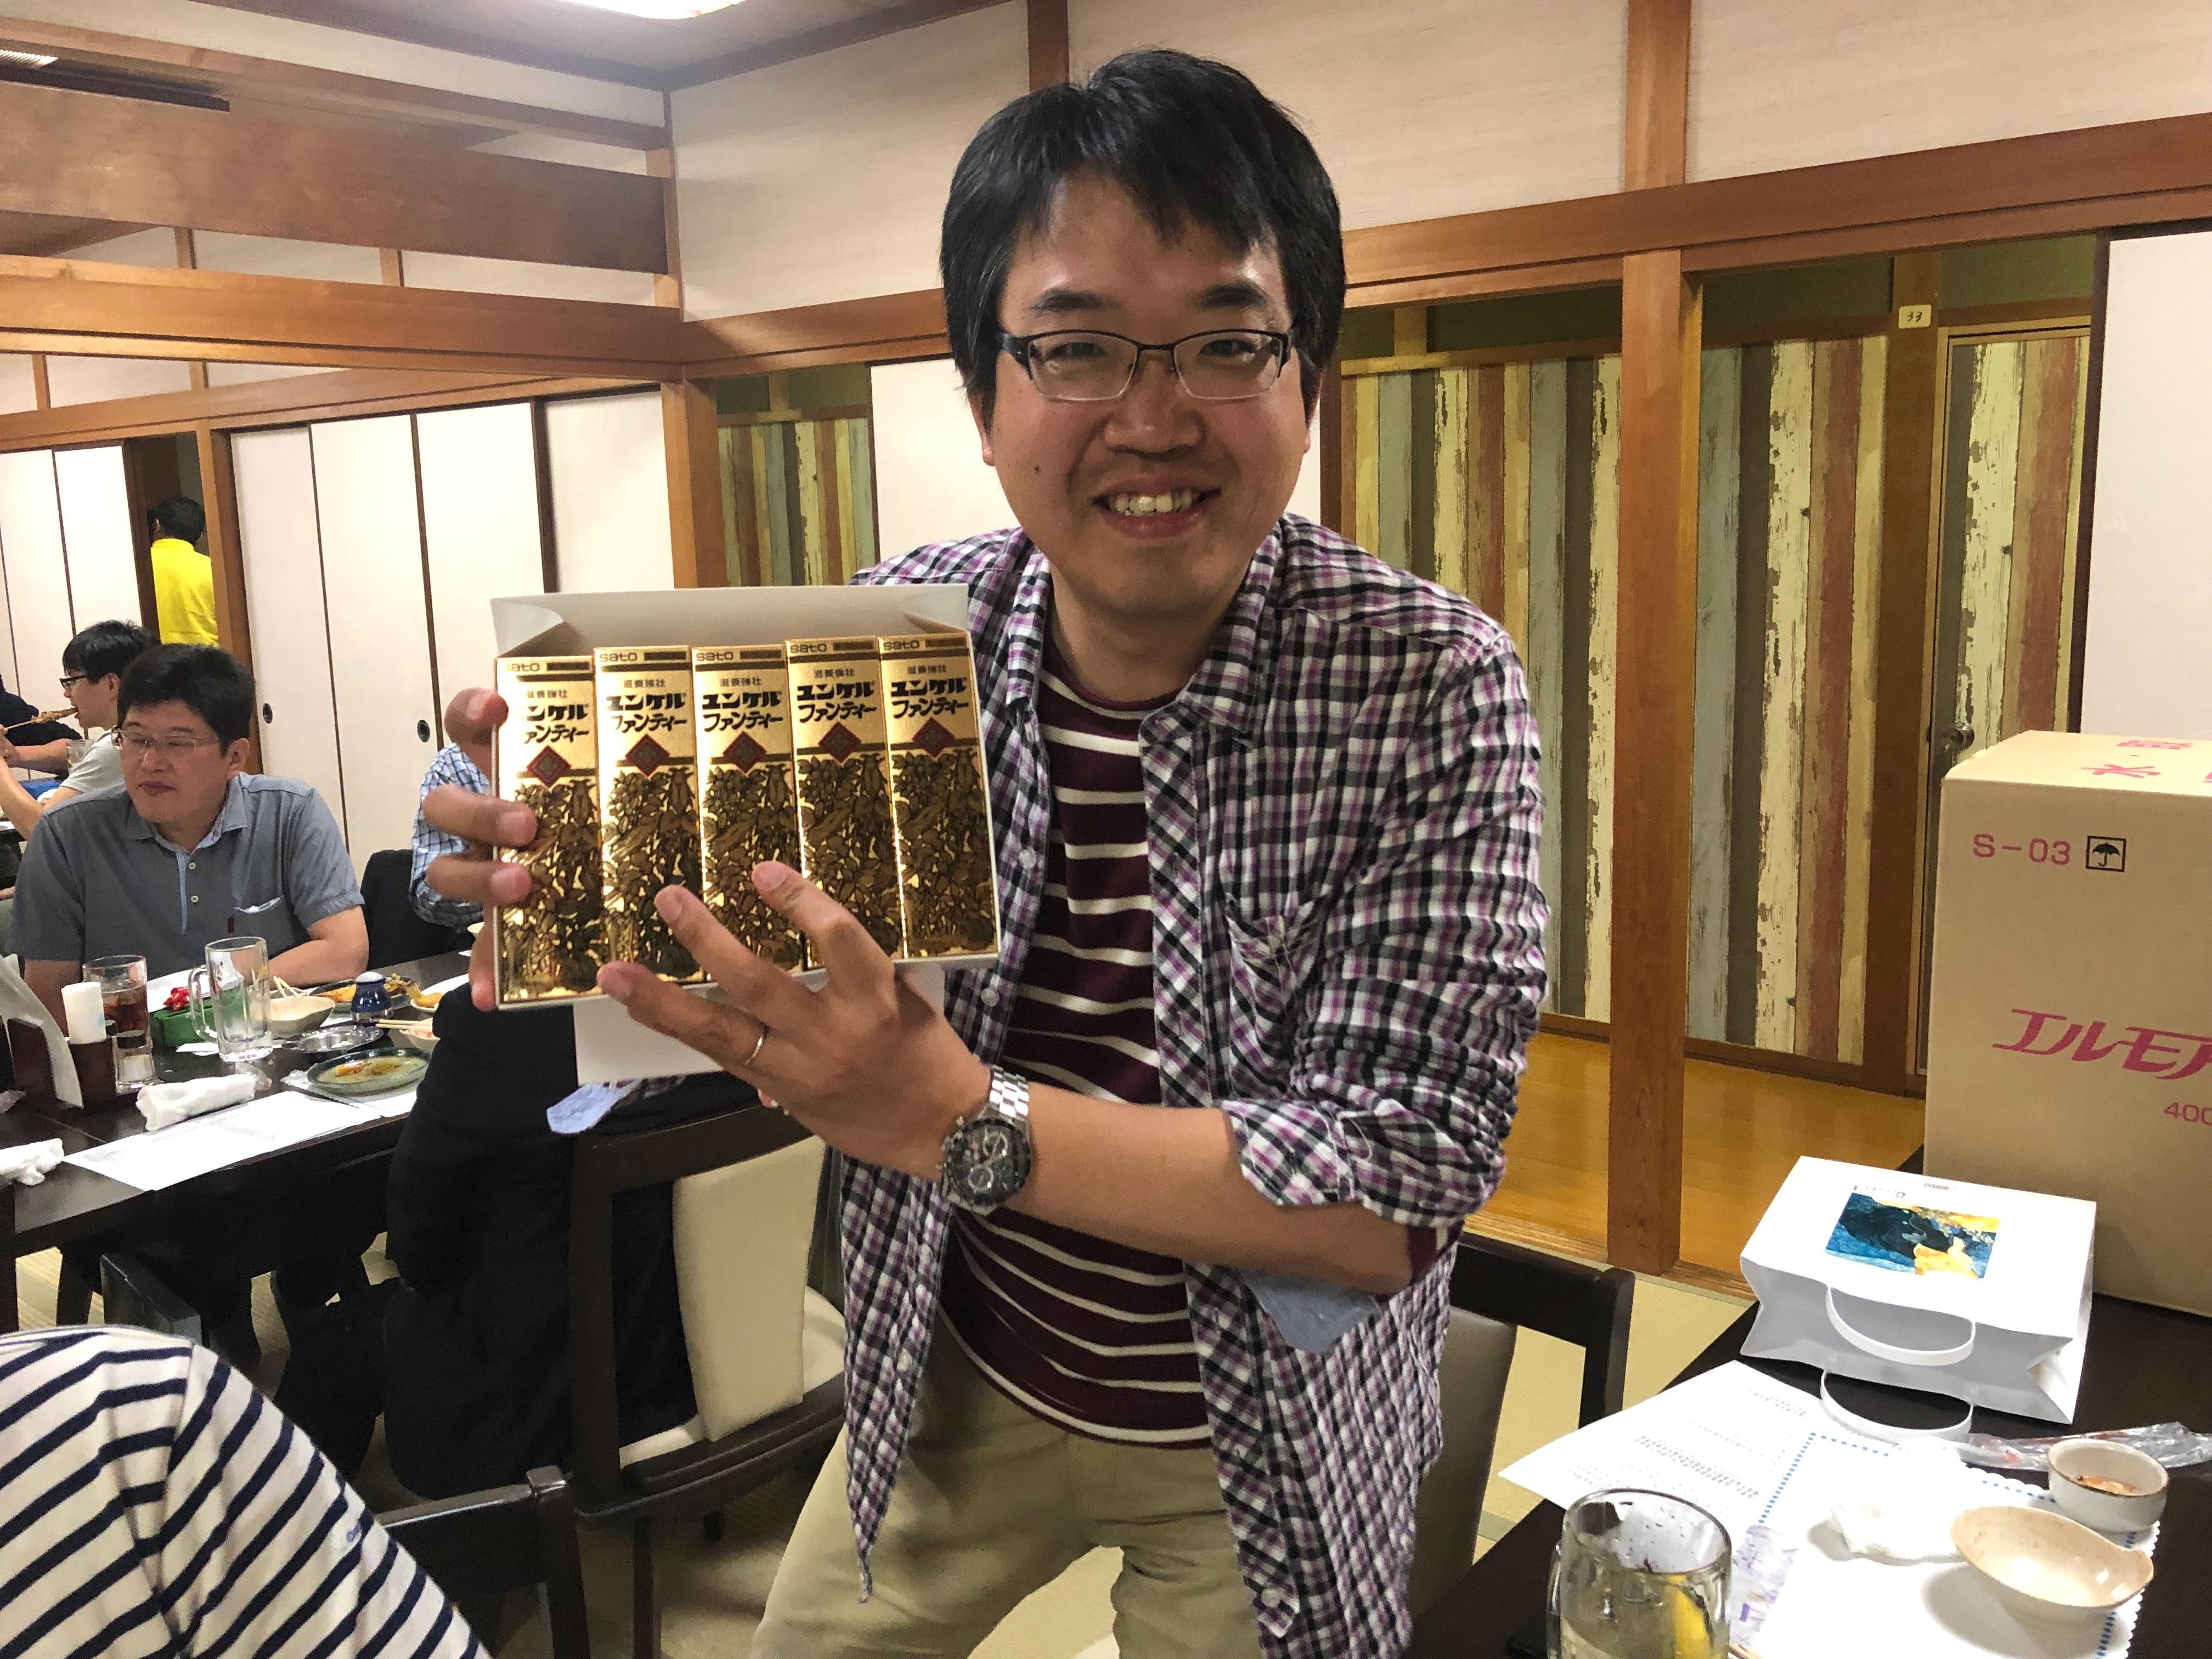 f:id:masanori-kato1972:20190519072346j:image